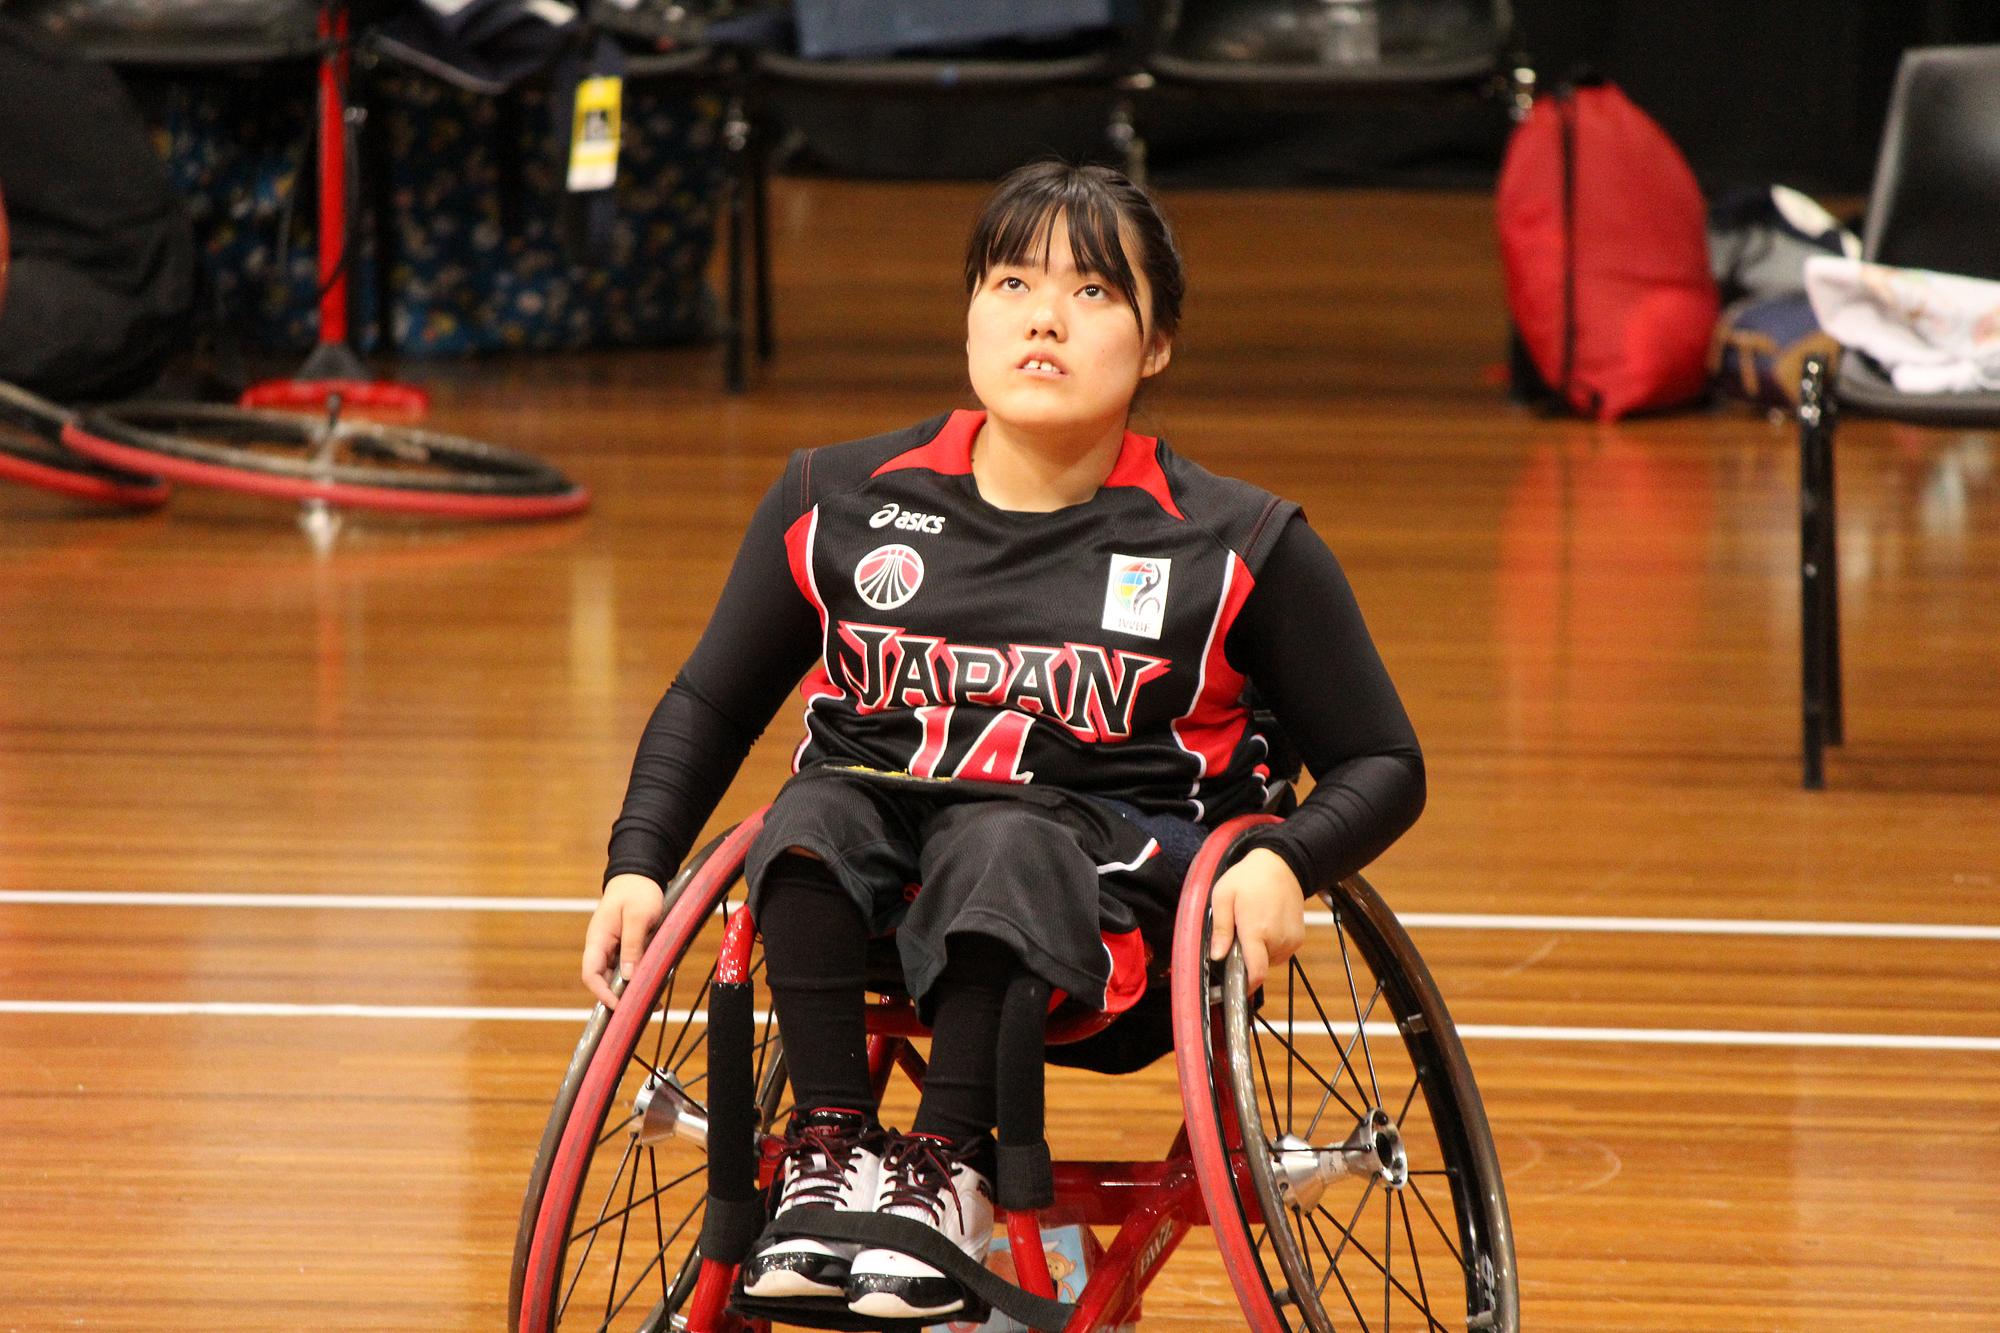 wheelchairs spots on Pinterest | Wheelchairs, Basketball ...